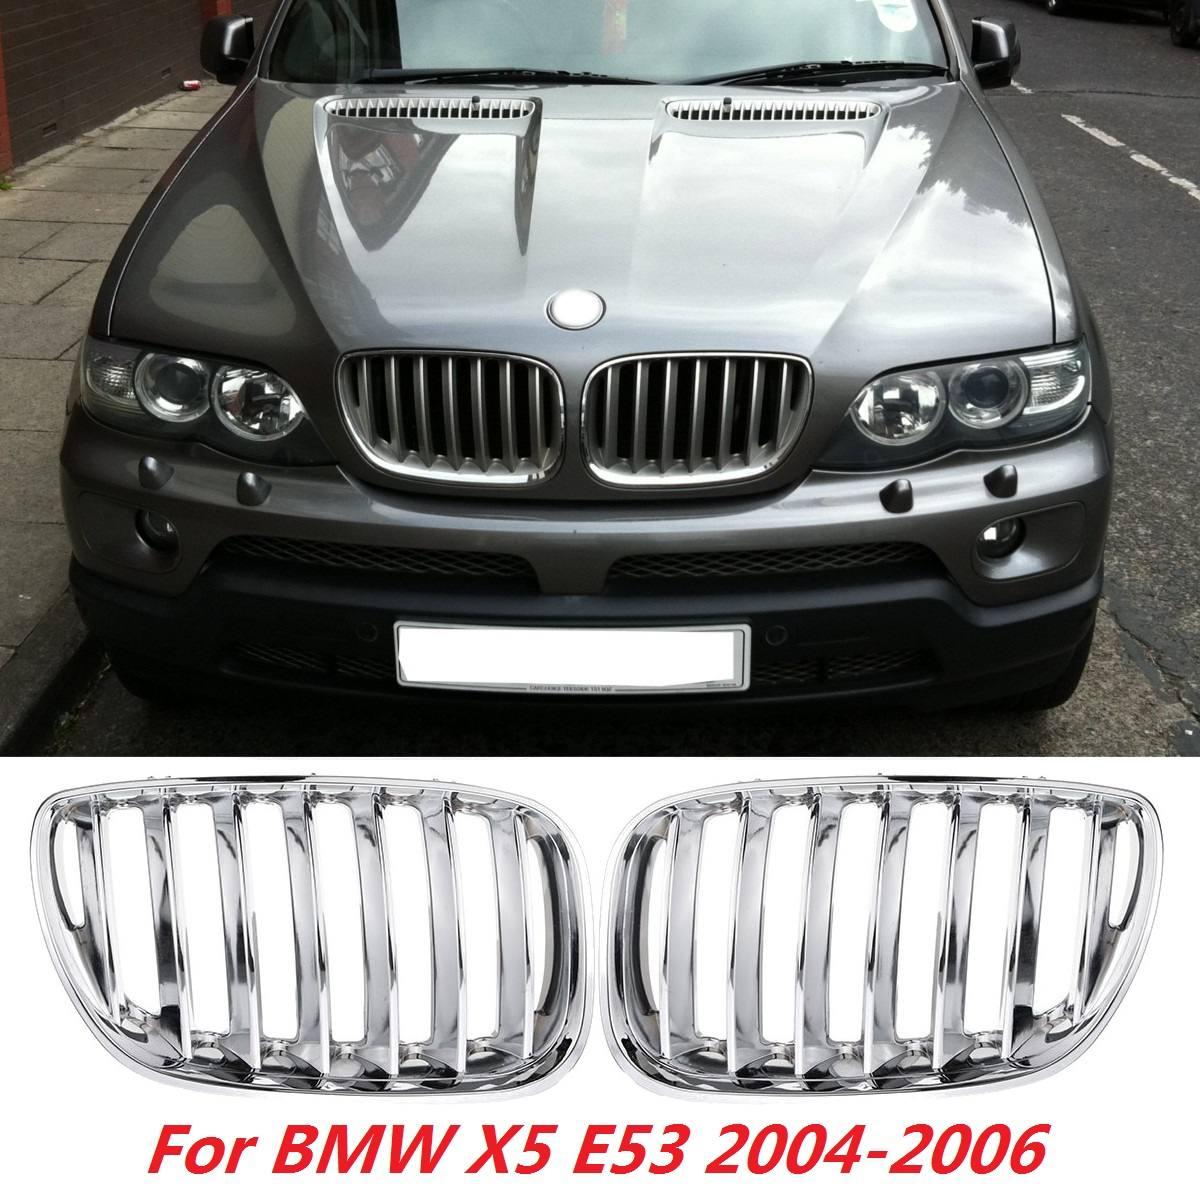 Facelift Front Bumper Bracket Holder Cover Guide Fit For BMW X5 E53 2003-2006